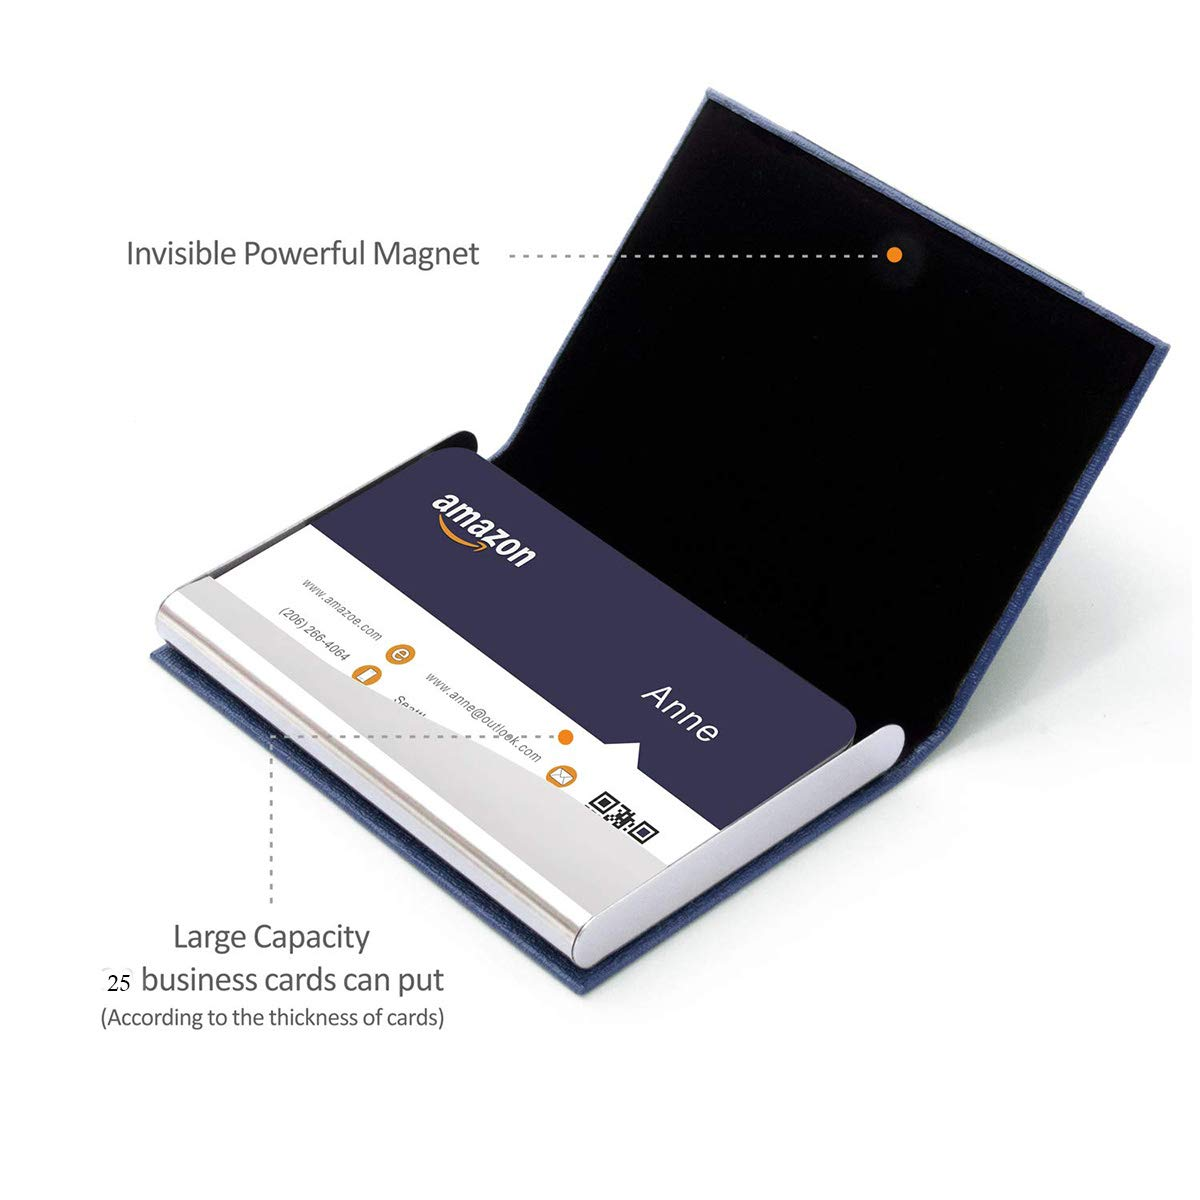 Bestbling Bling Pure Handmade Bling Bling strass in acciaio inossidabile porta biglietti nome card case Ingots